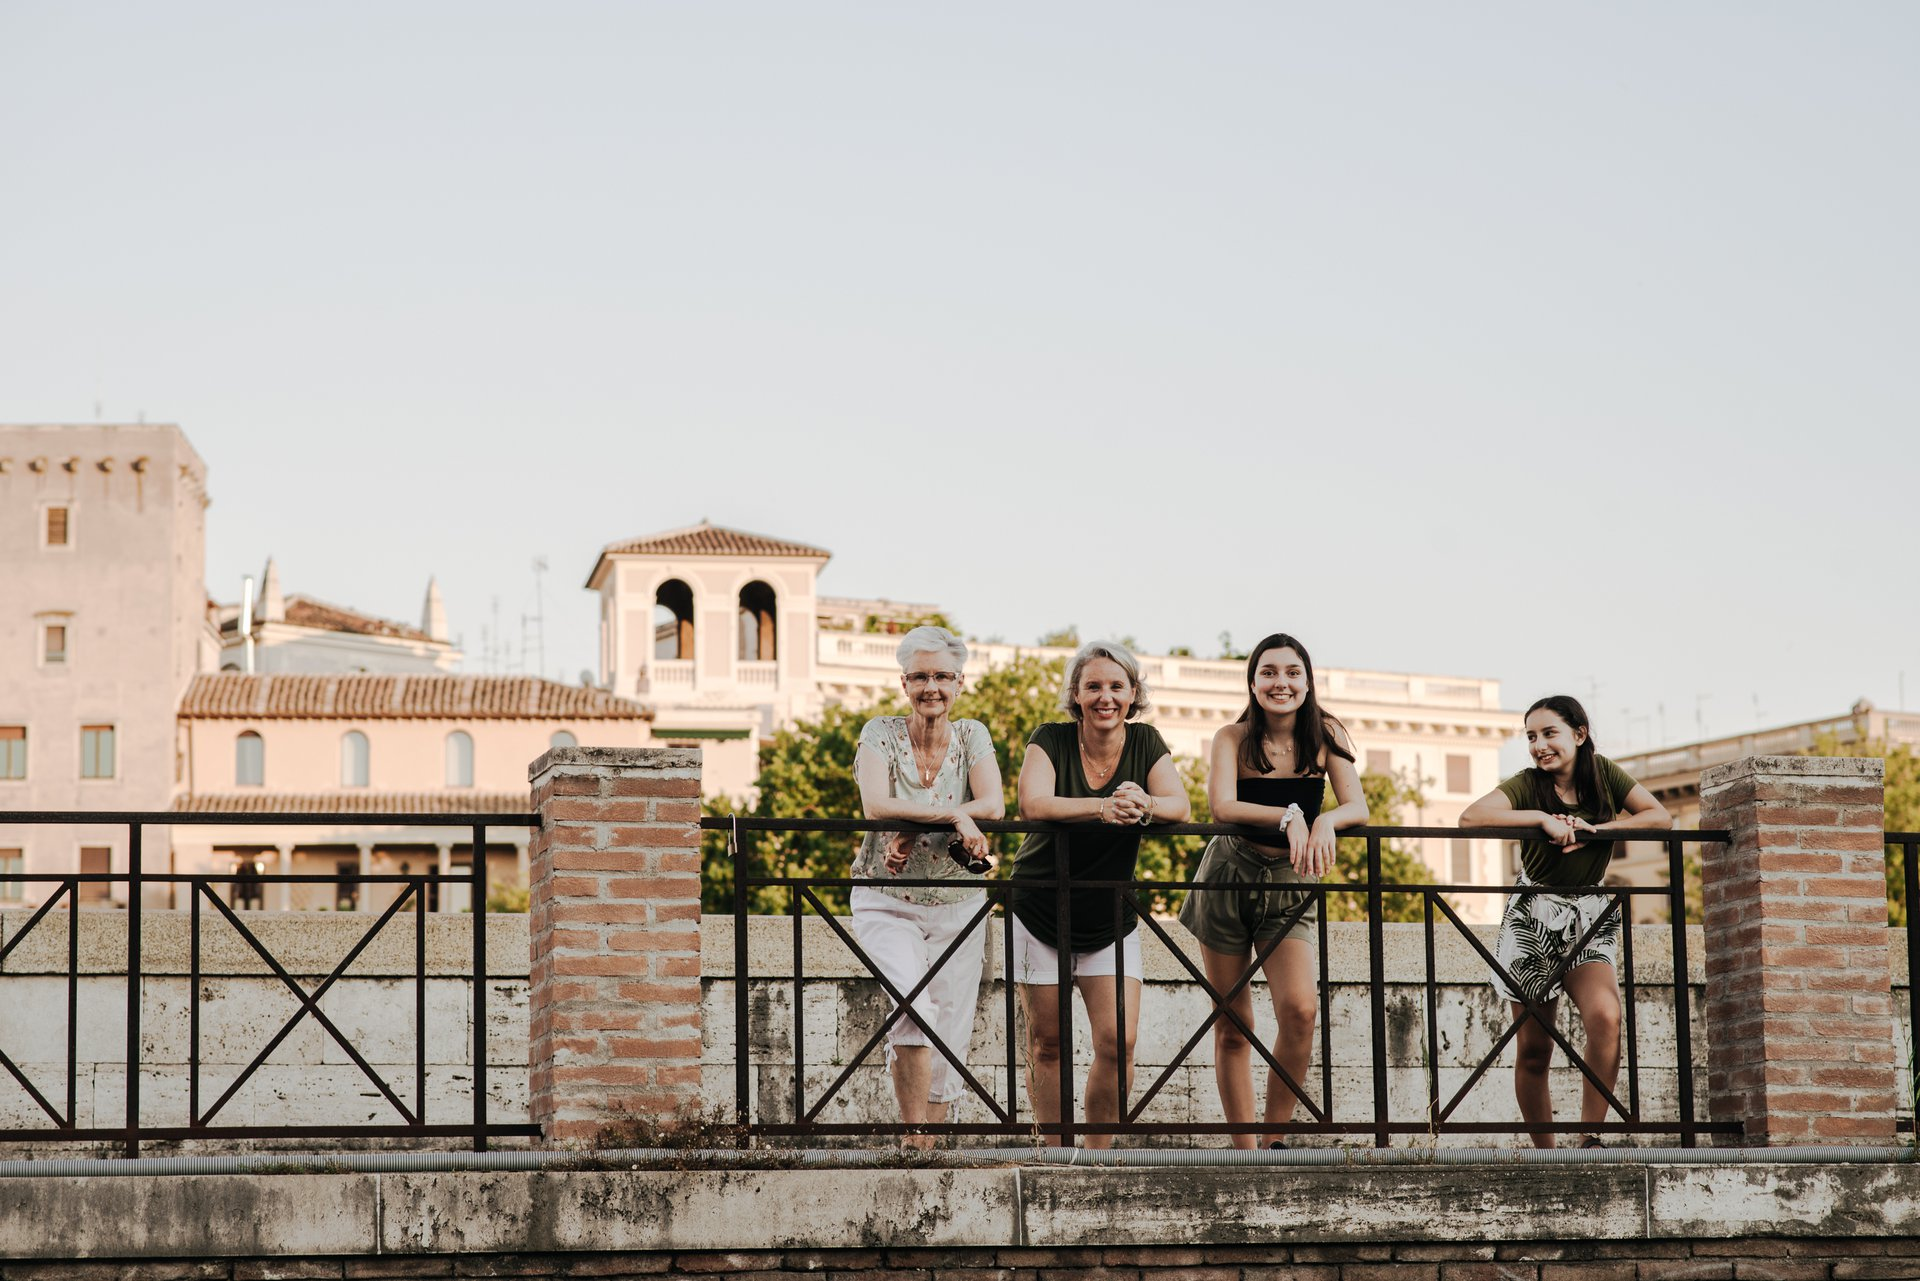 Rome-Italy-travel-story-Flytographer-4